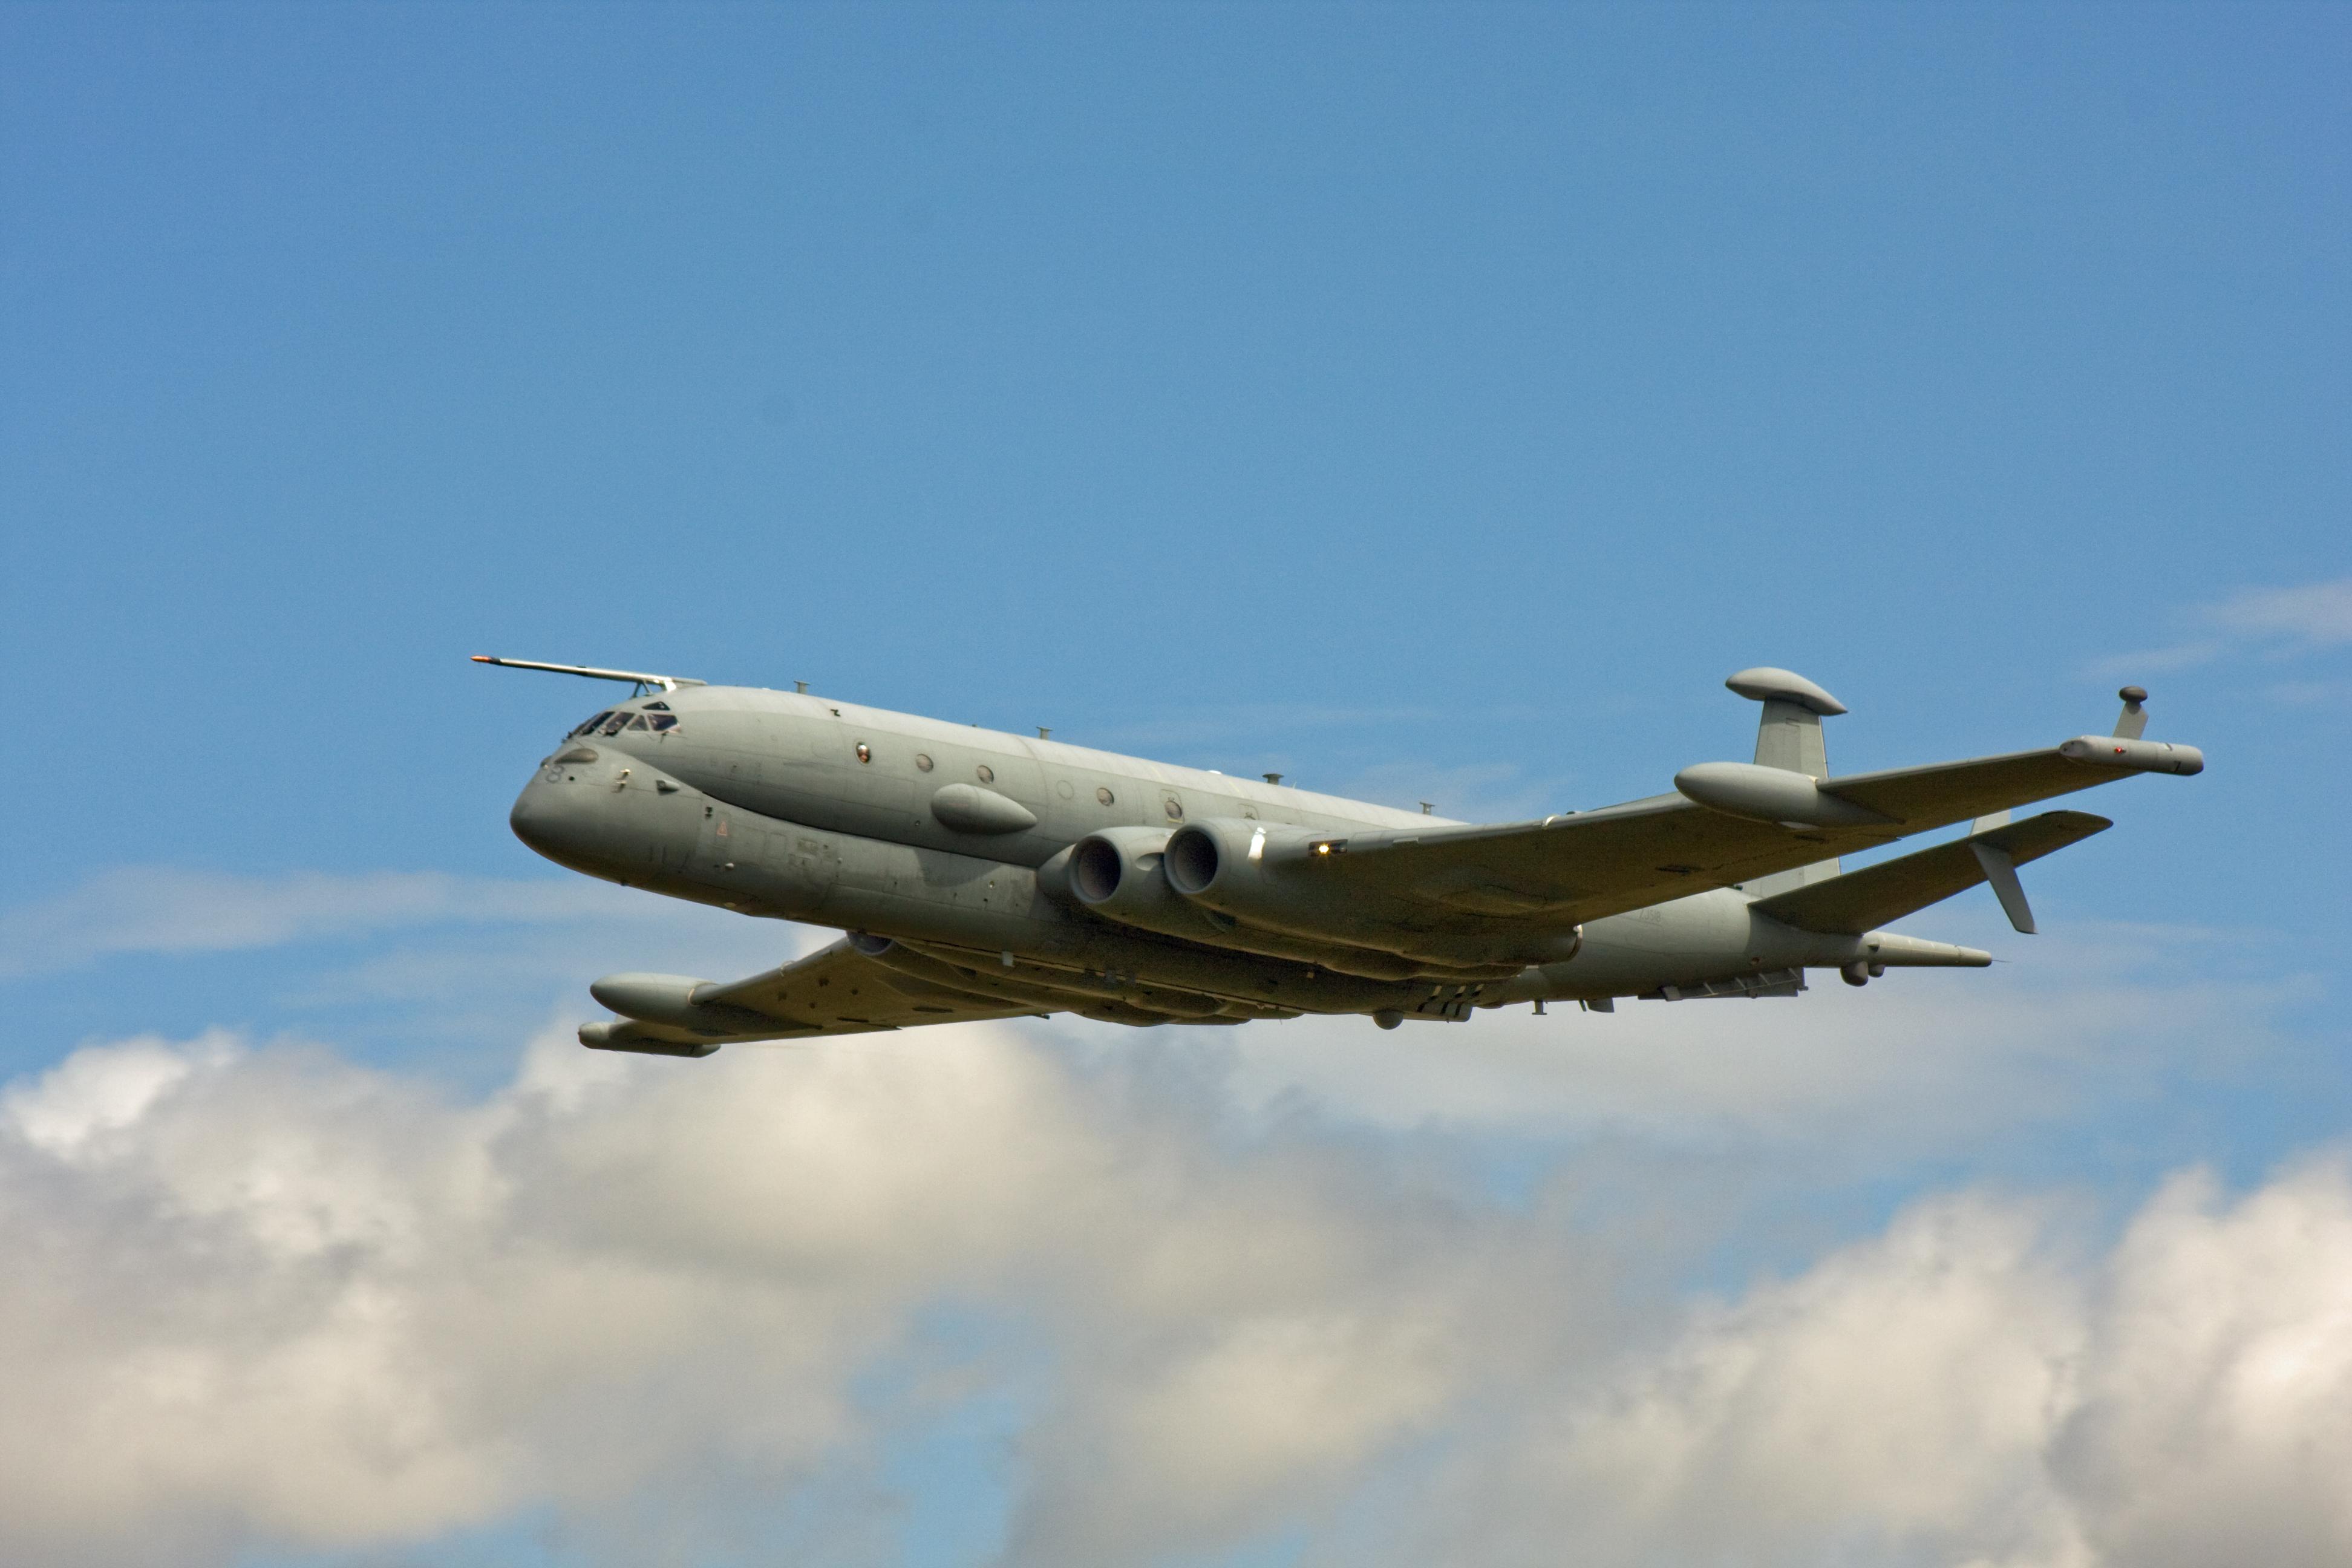 BAE Systems Nimrod MRA4 - Wikipedia